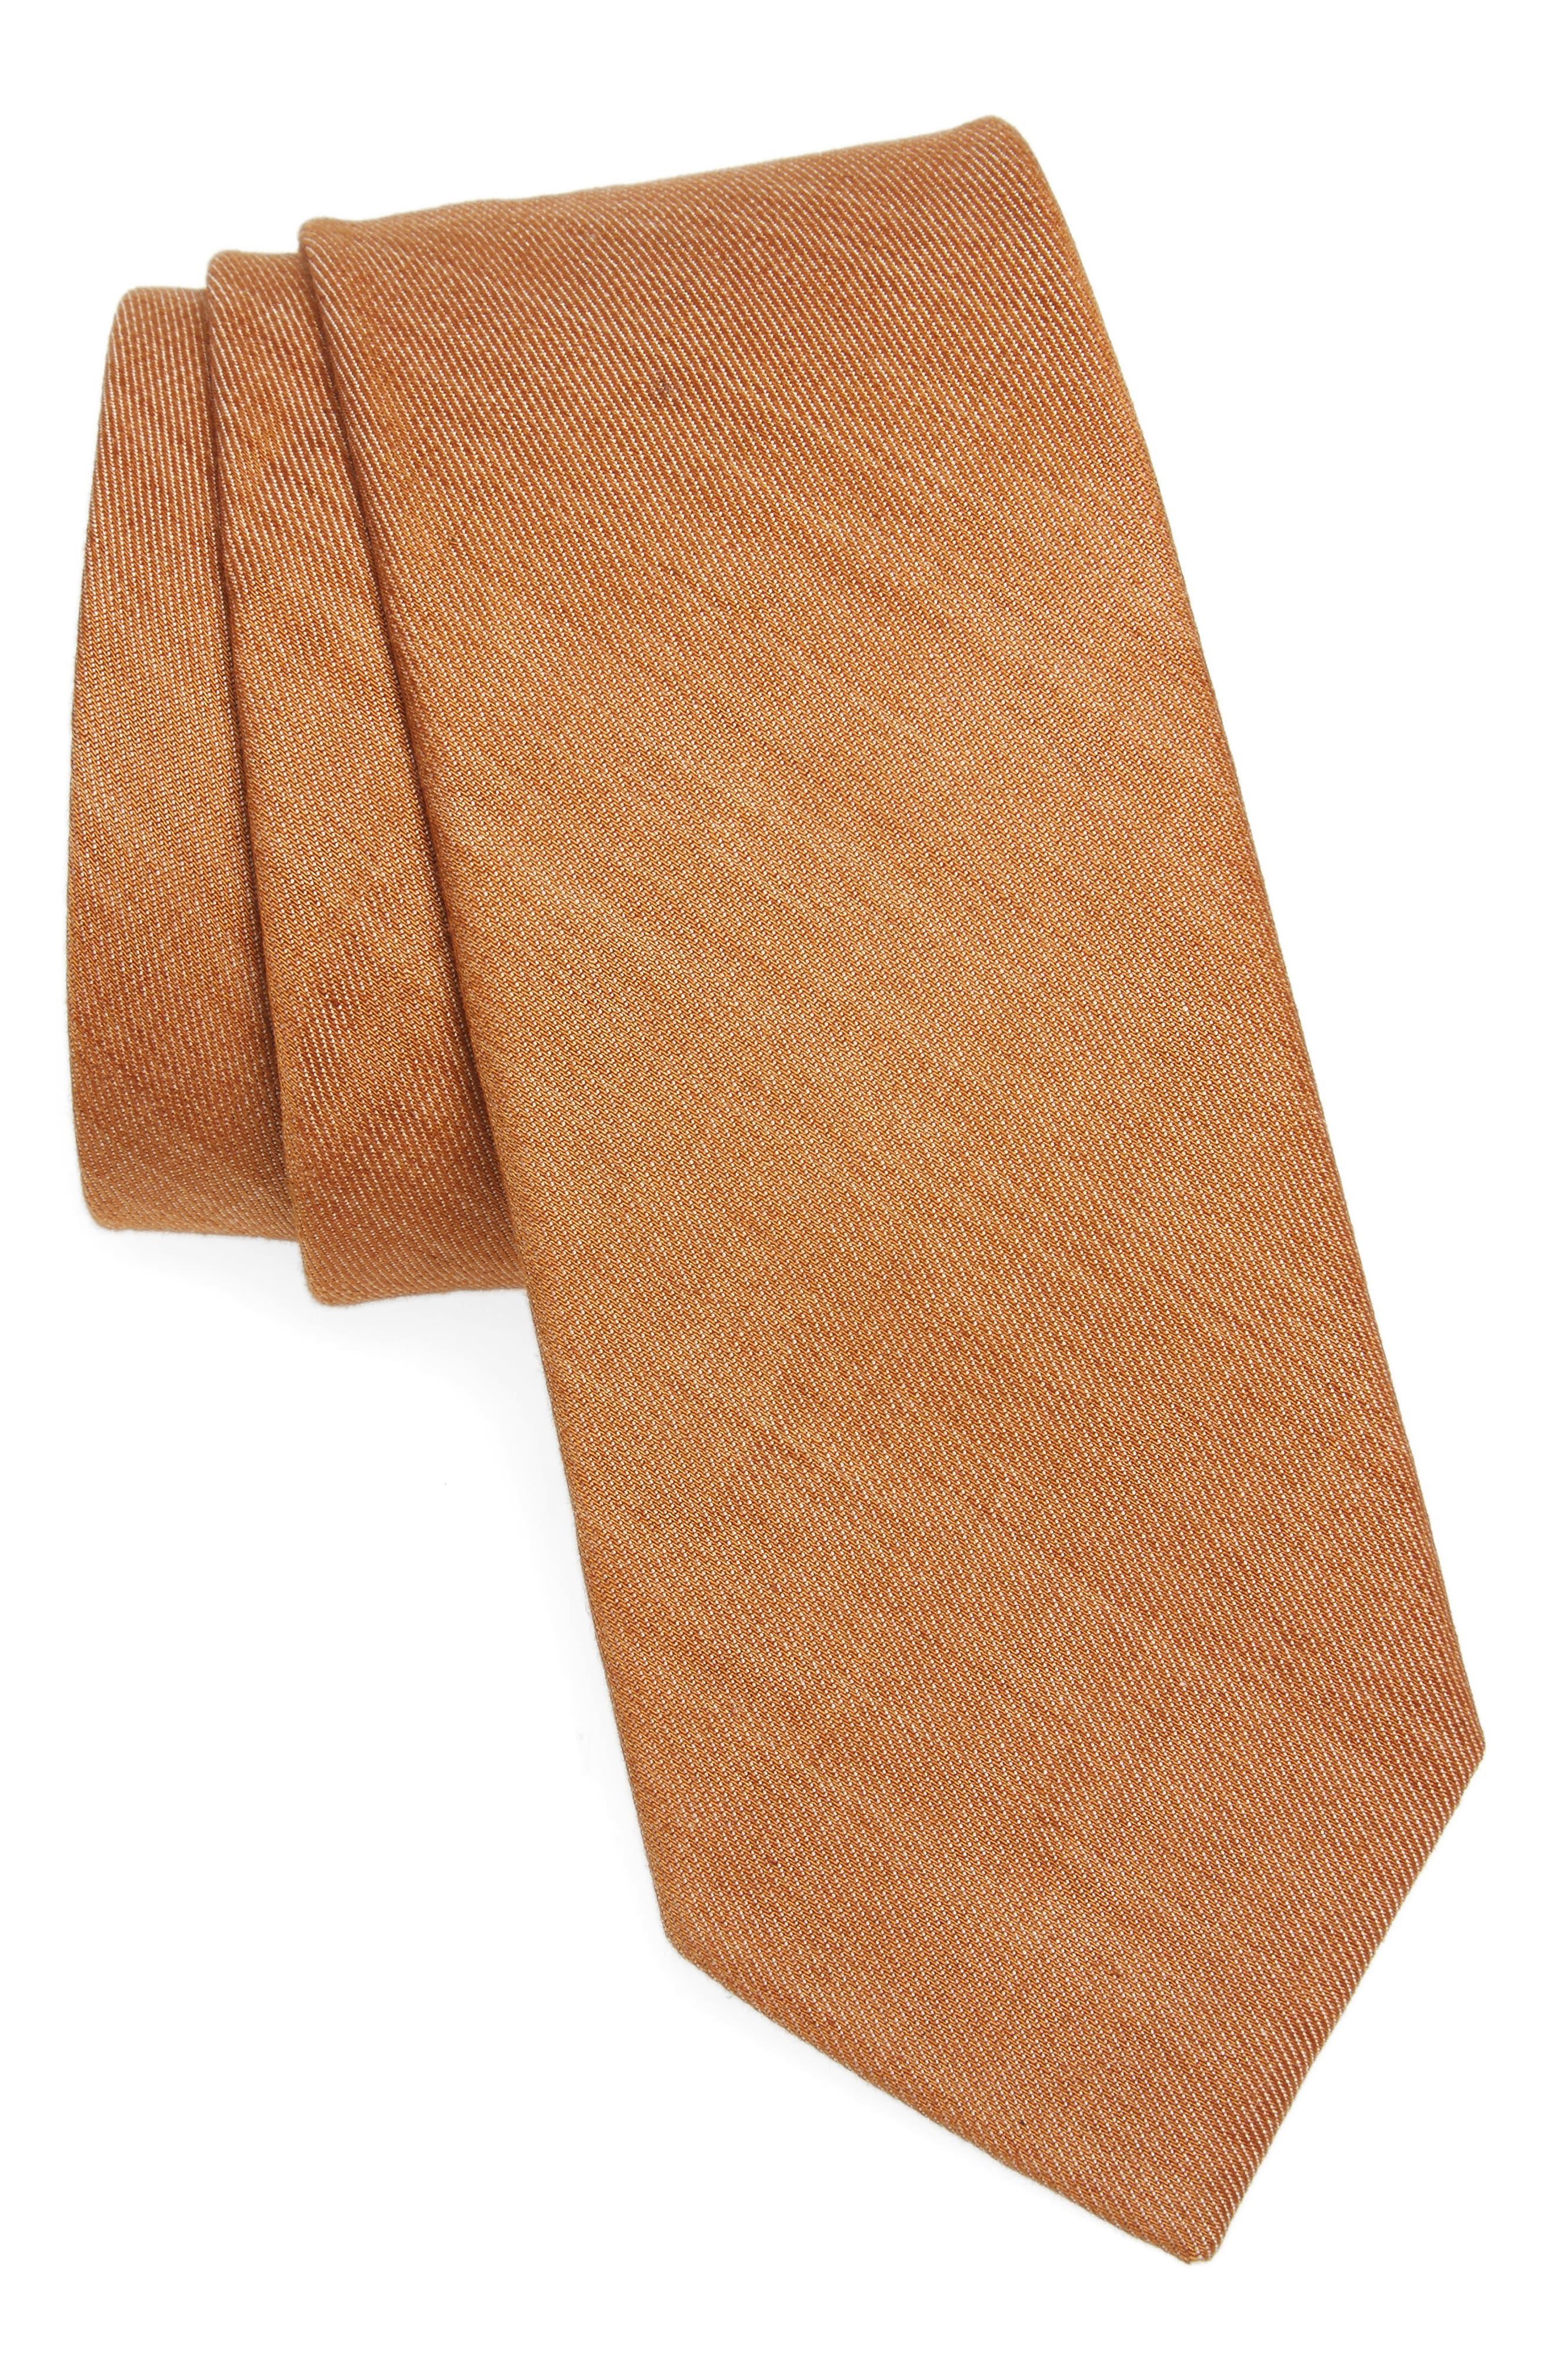 Abbey Solid Cotton Tie,                         Main,                         color, 220